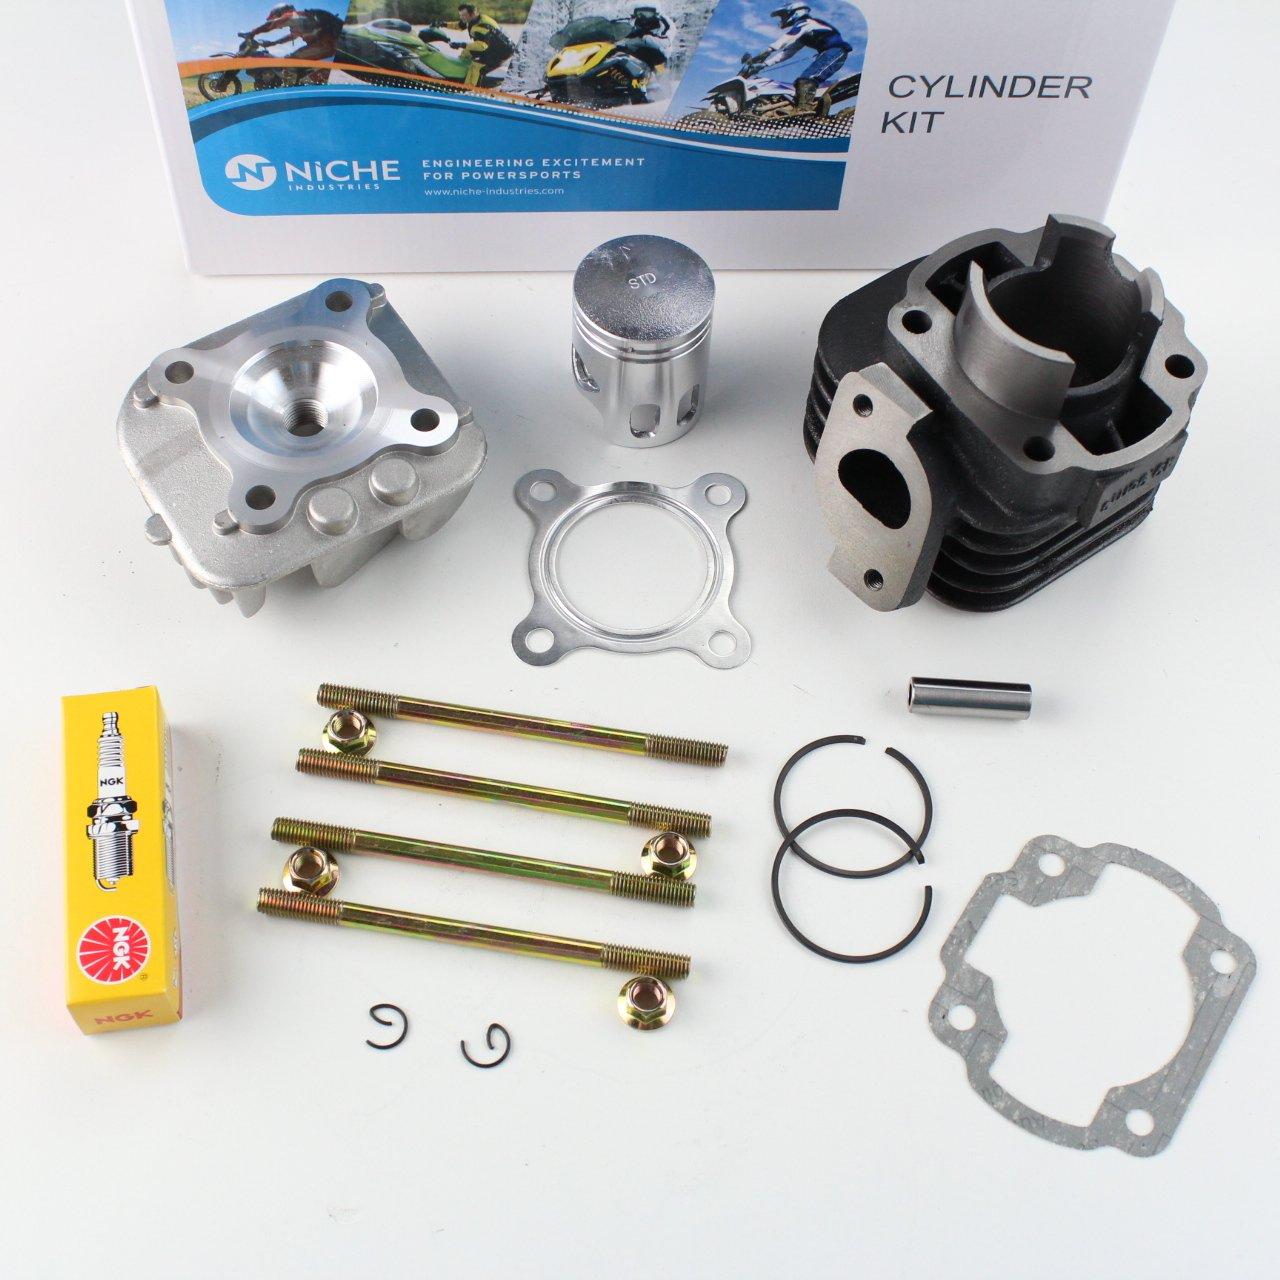 NICHE Cylinder Piston Gasket Cylinder Head Top End Kit for Polaris Scrambler 50 2001-2003